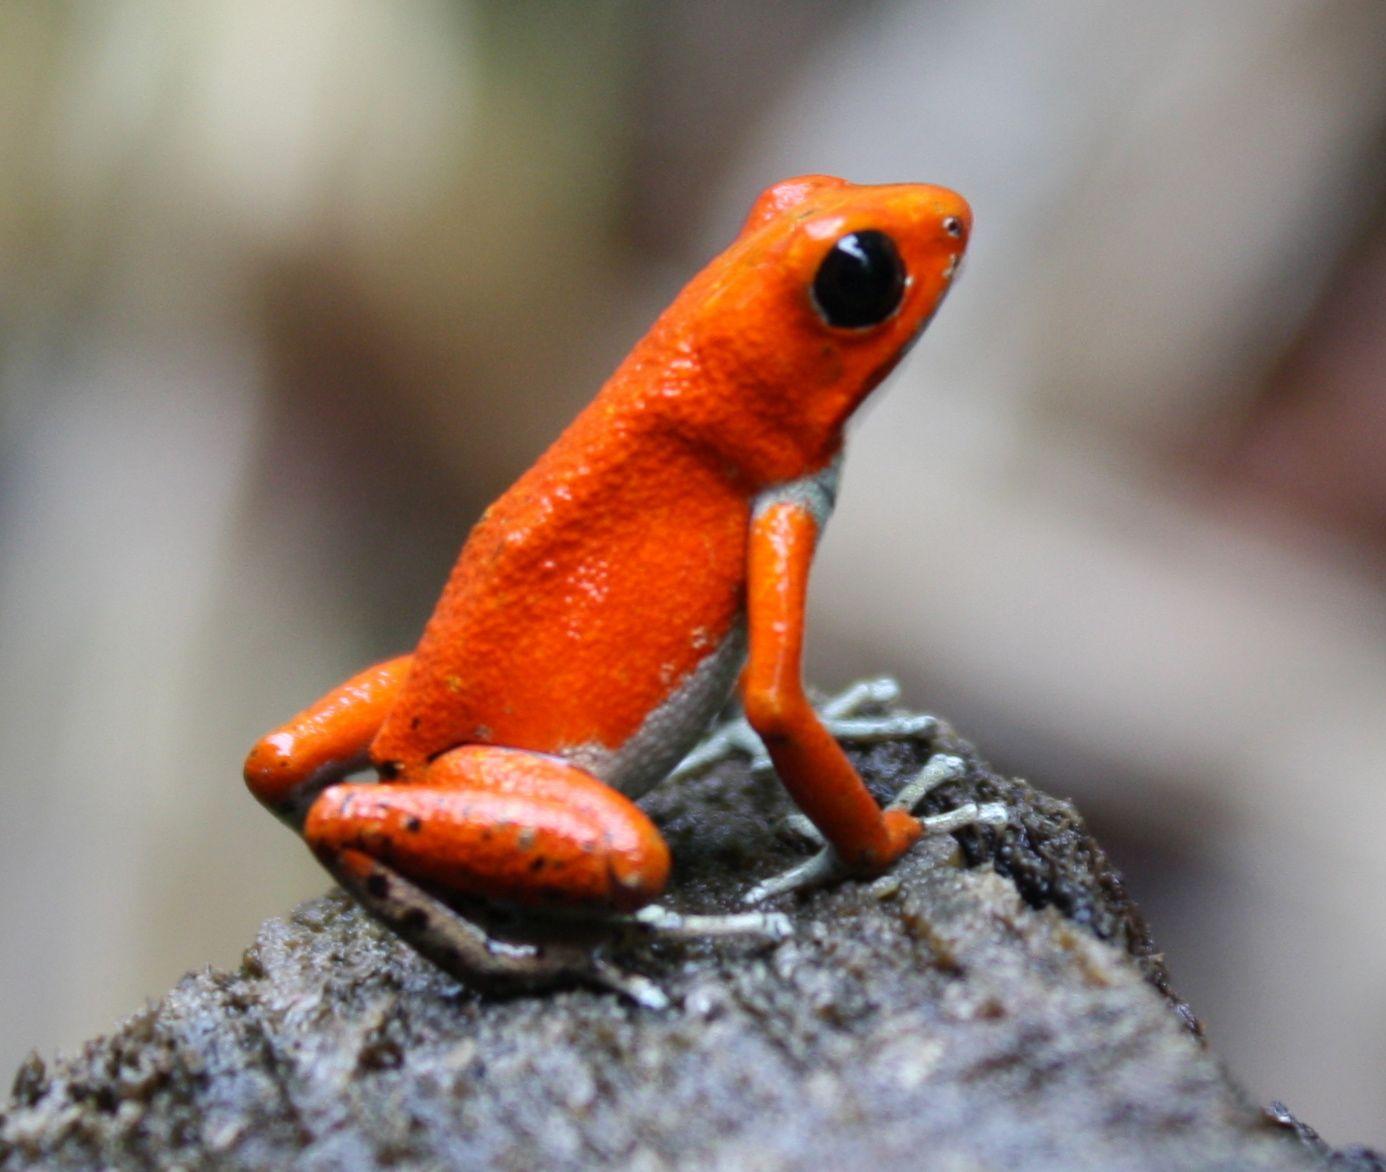 http://1.bp.blogspot.com/-3ixXQK8AyxQ/TiQ8dIuBeuI/AAAAAAAAAx8/aer-6FLvsyI/s1600/red_frog.jpg